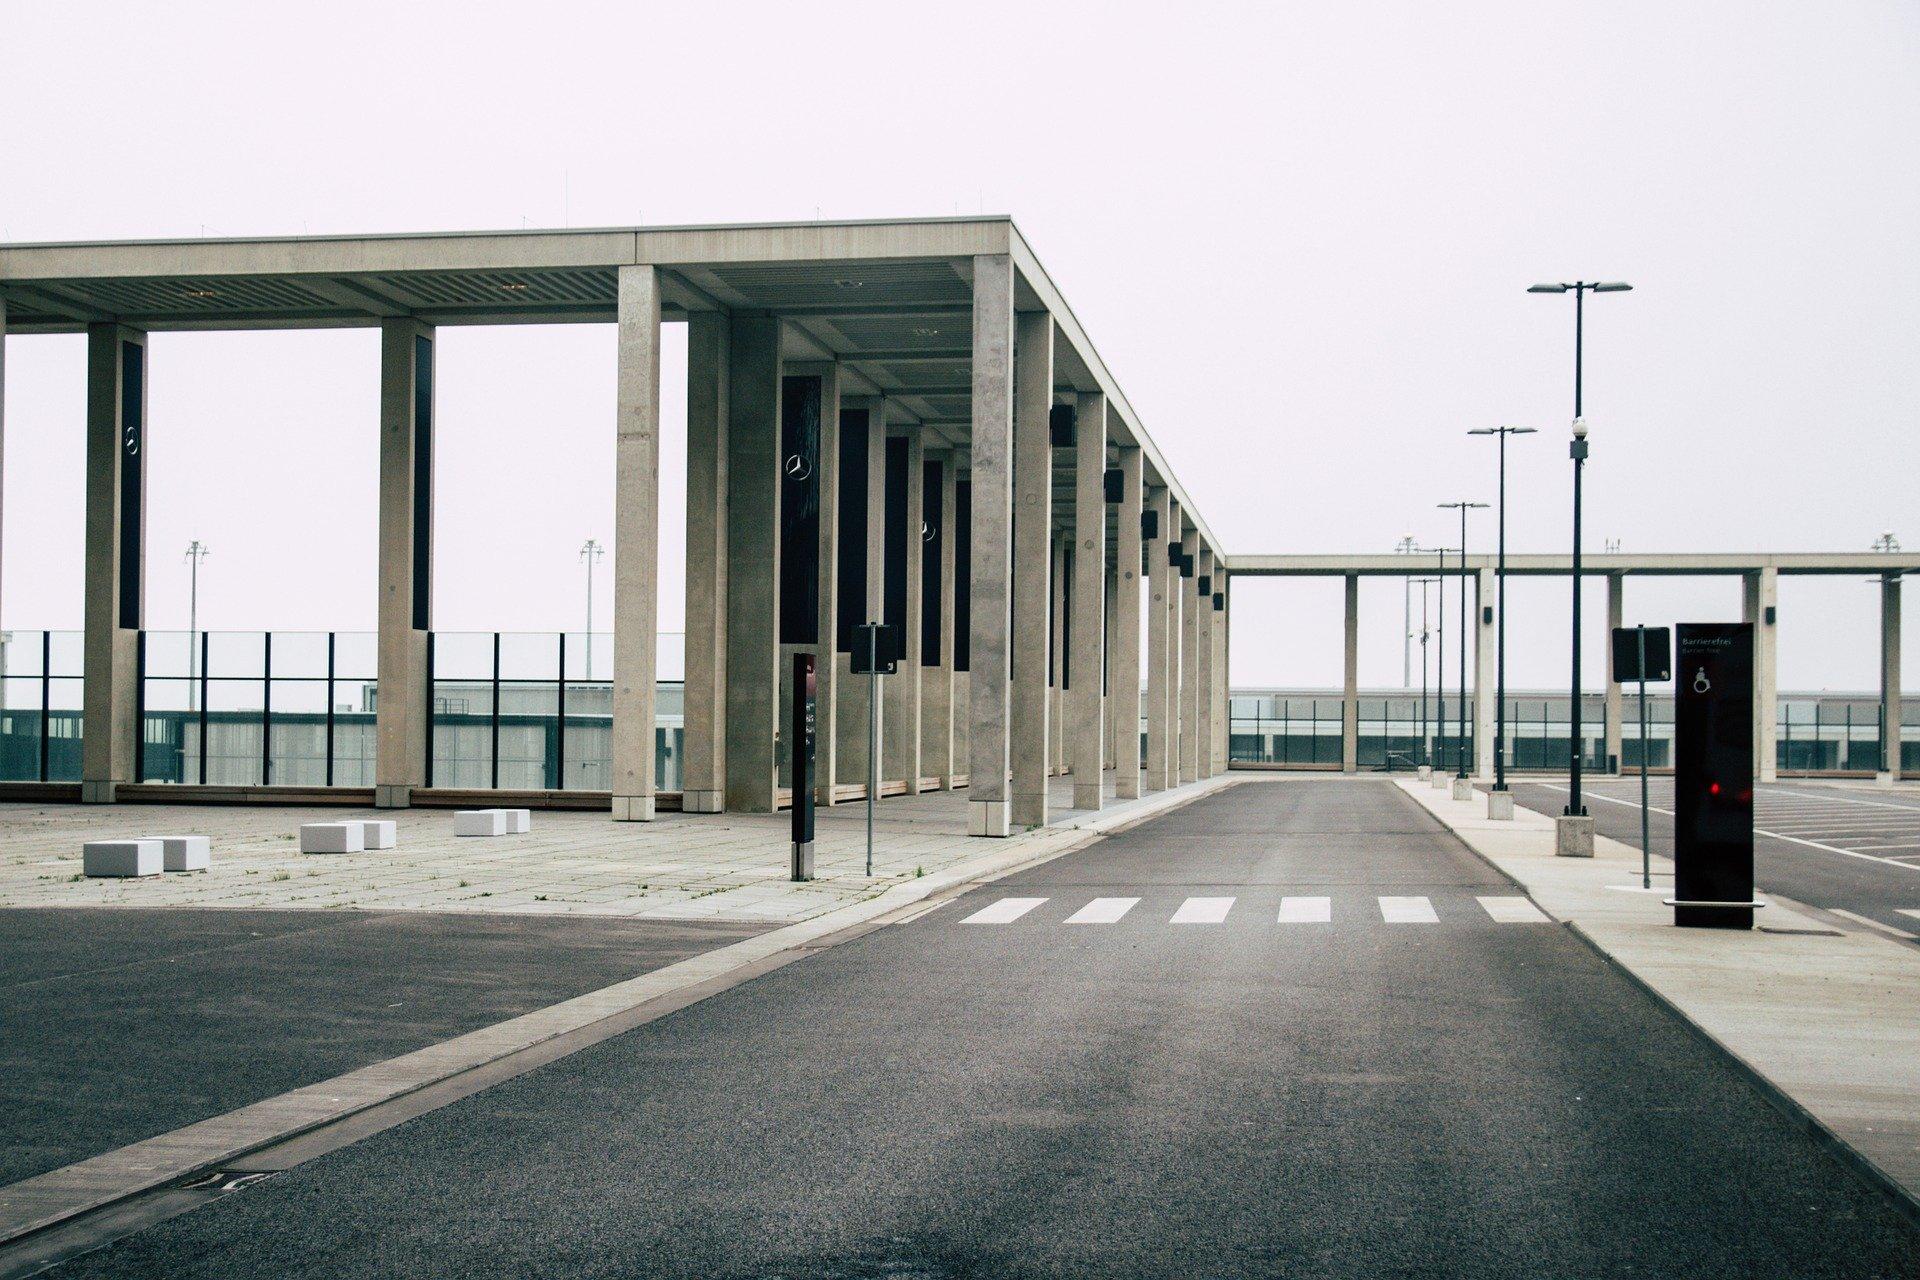 BER Flughafen